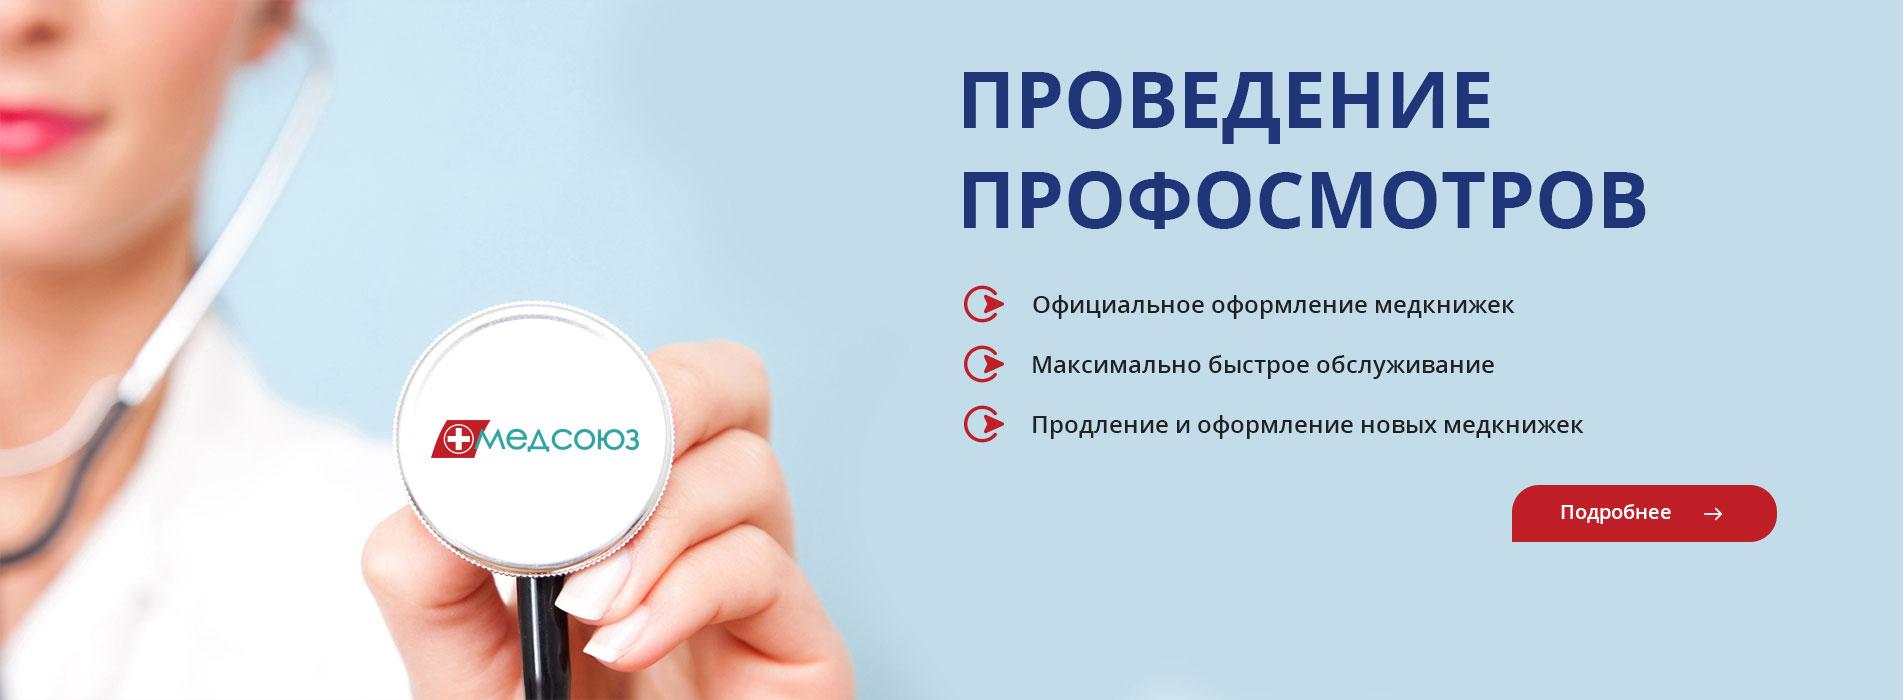 Медицинский центр «Мед-Cоюз»